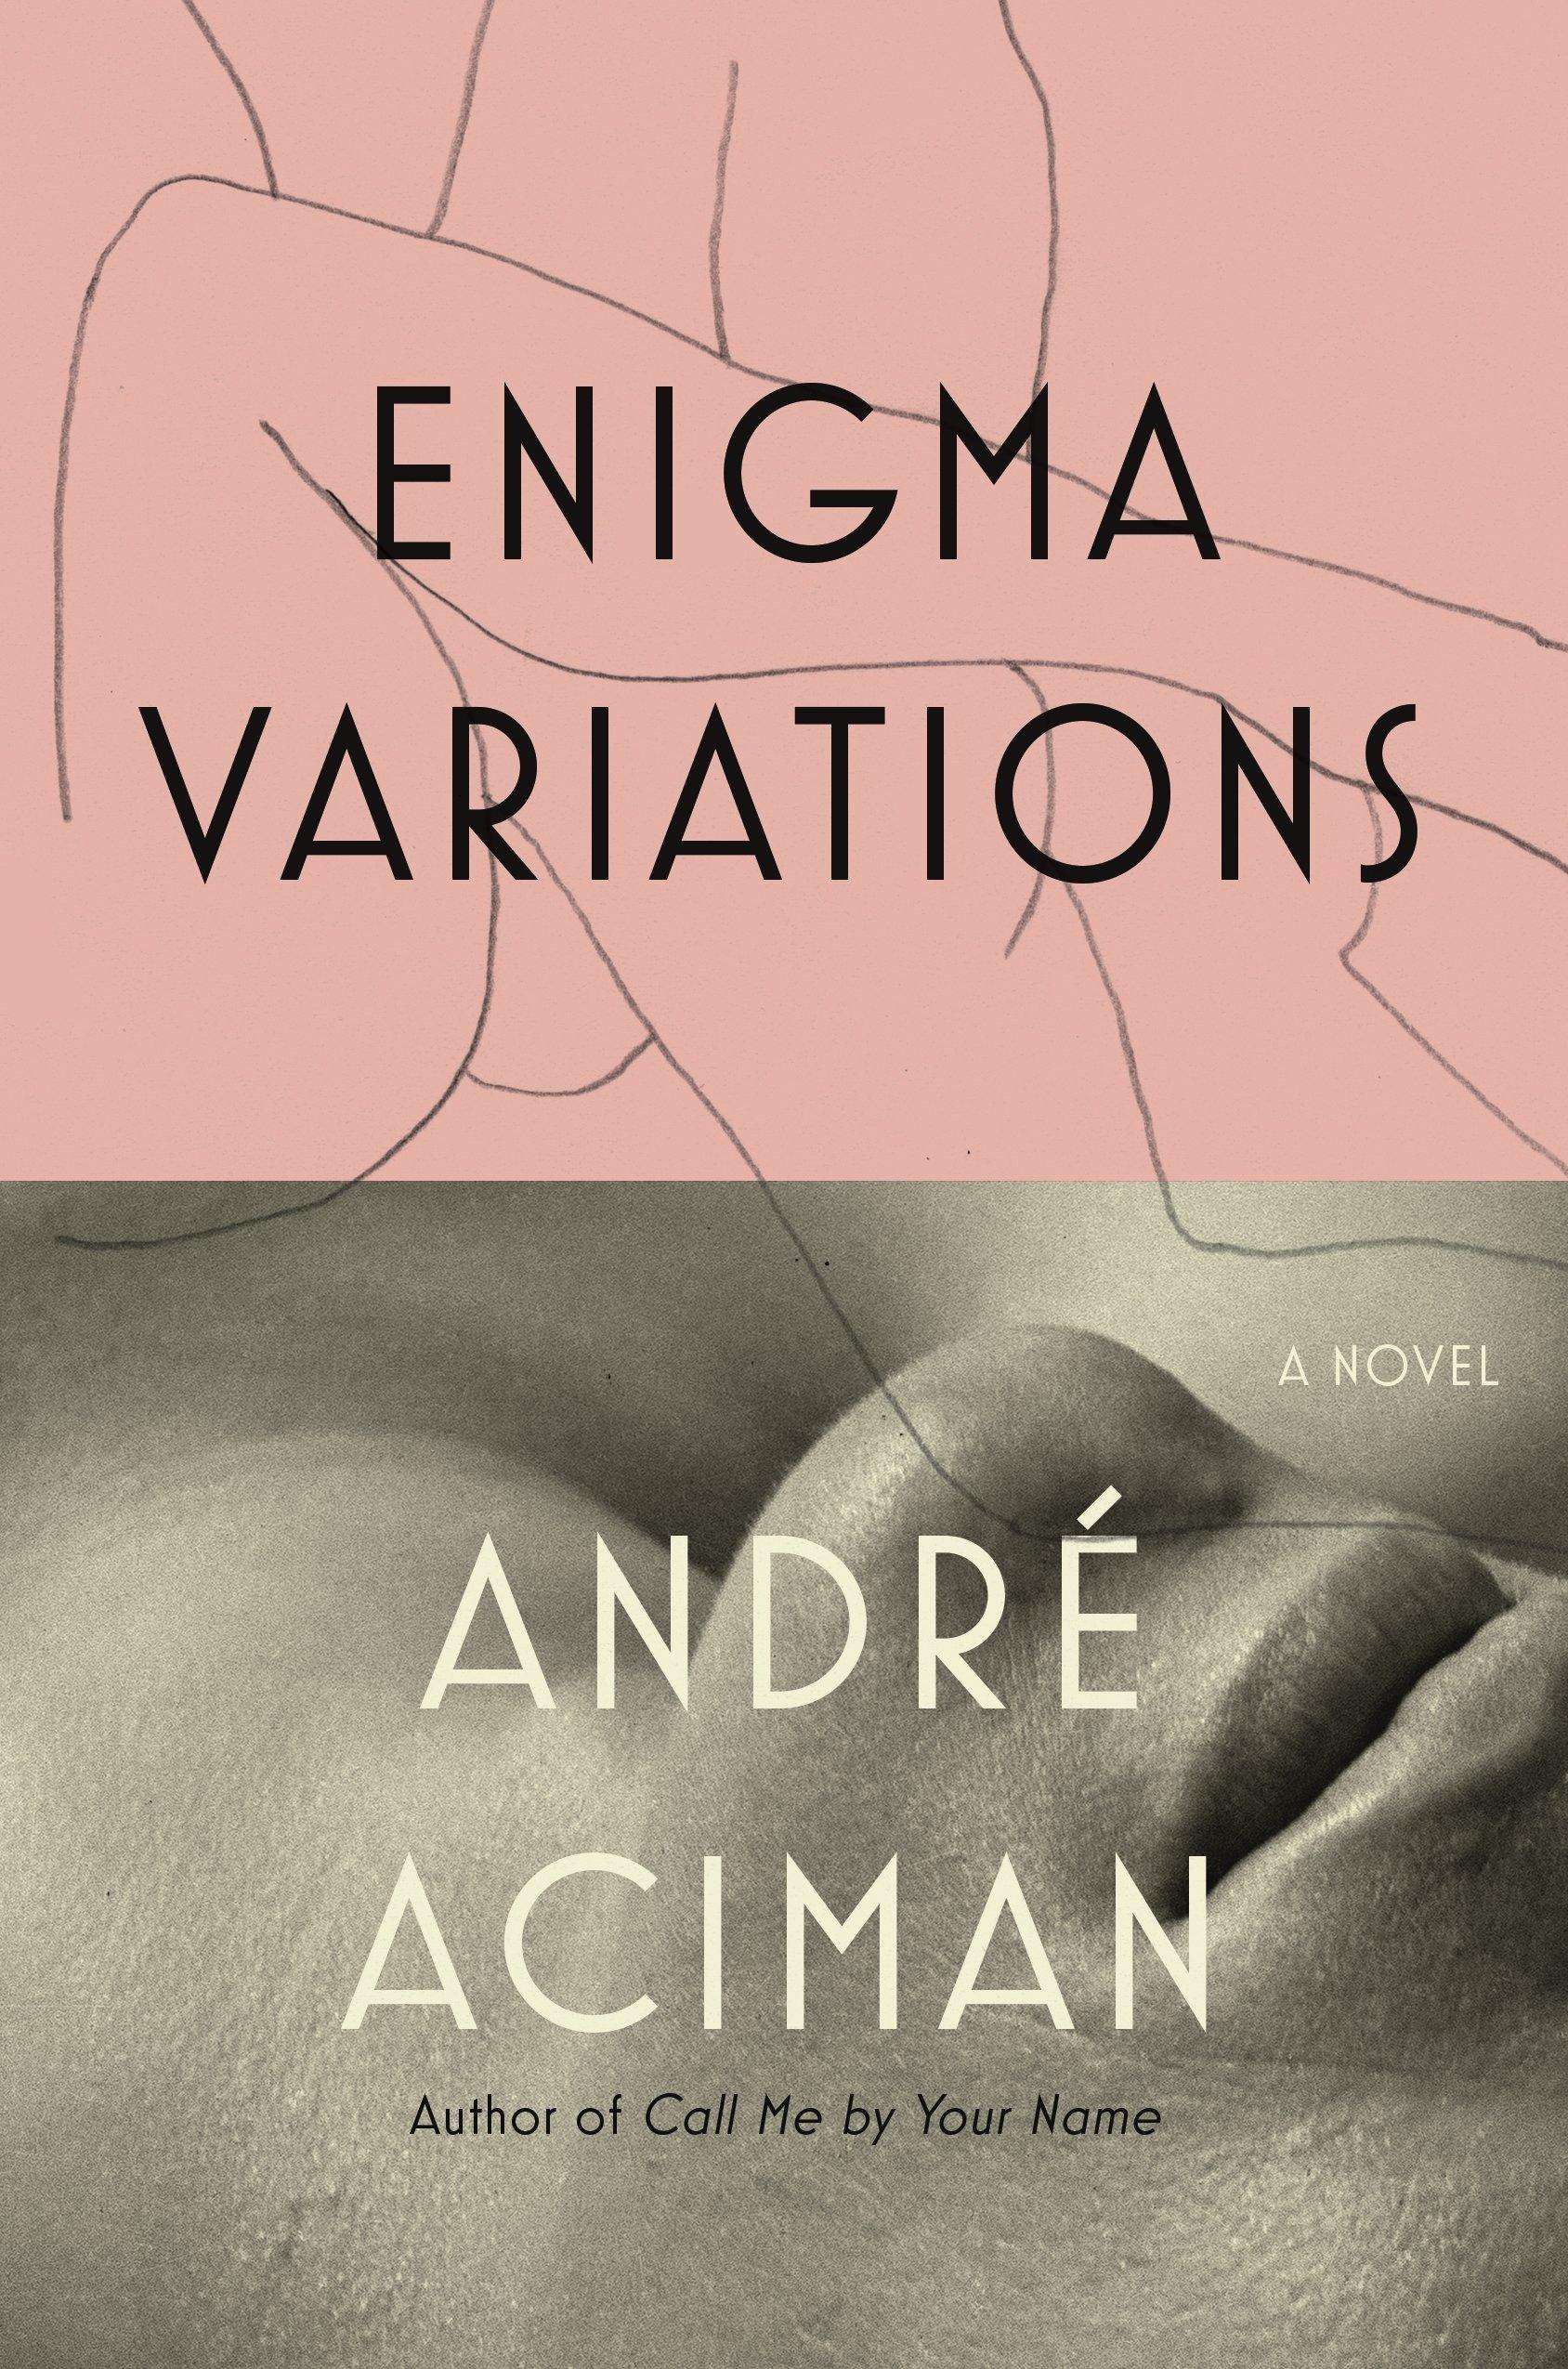 Opinion Publishers of erotic novels